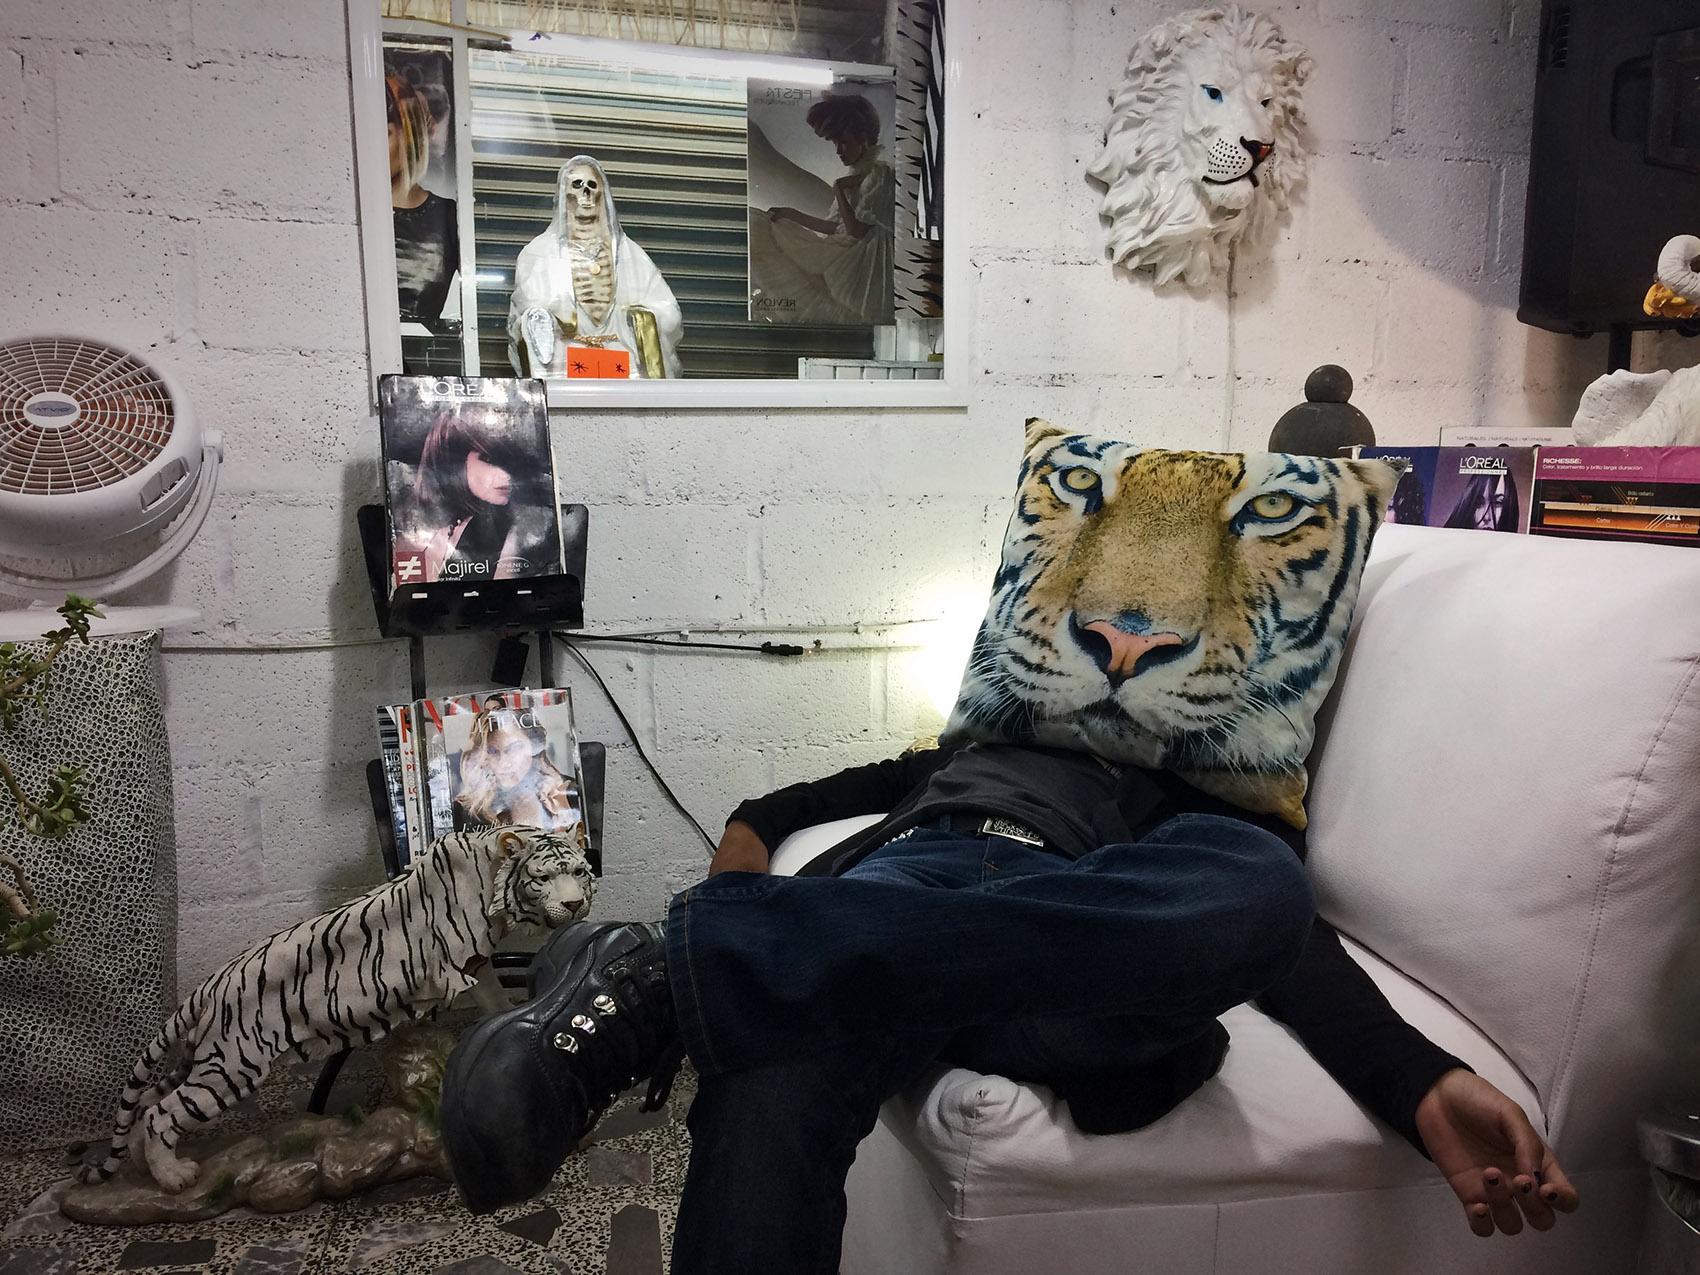 Tigre por Ockesaid a.k.a Joel Lugo - Street Photographer